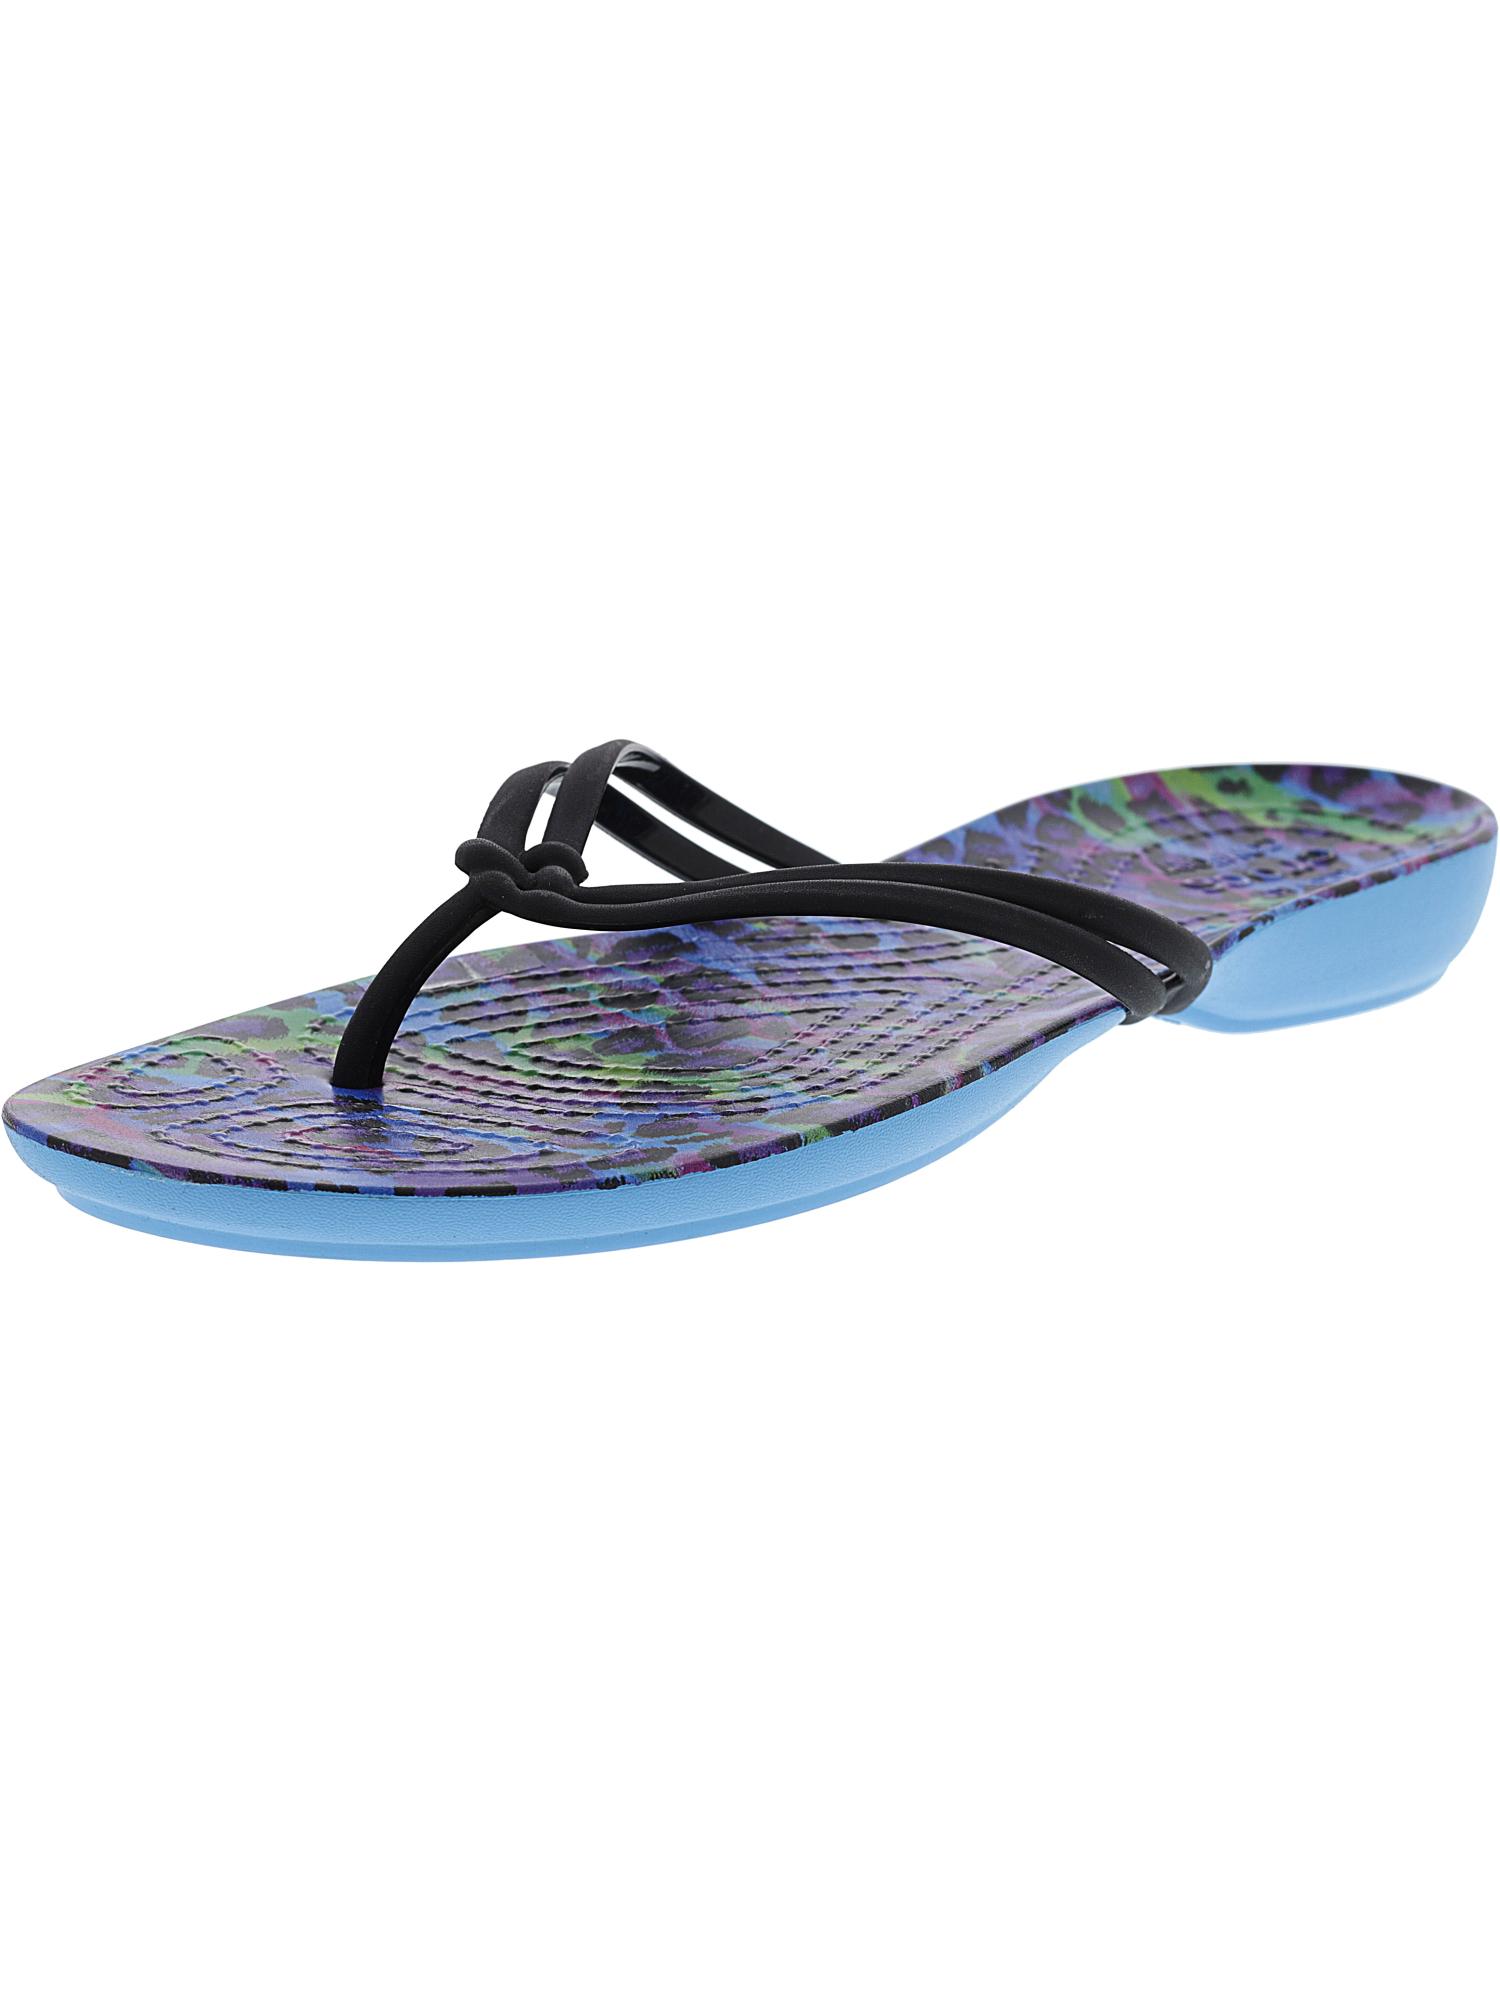 75580249436d91 Crocs Women s Kadee Ii Leopard Print Flip Flop Ltd Sandal